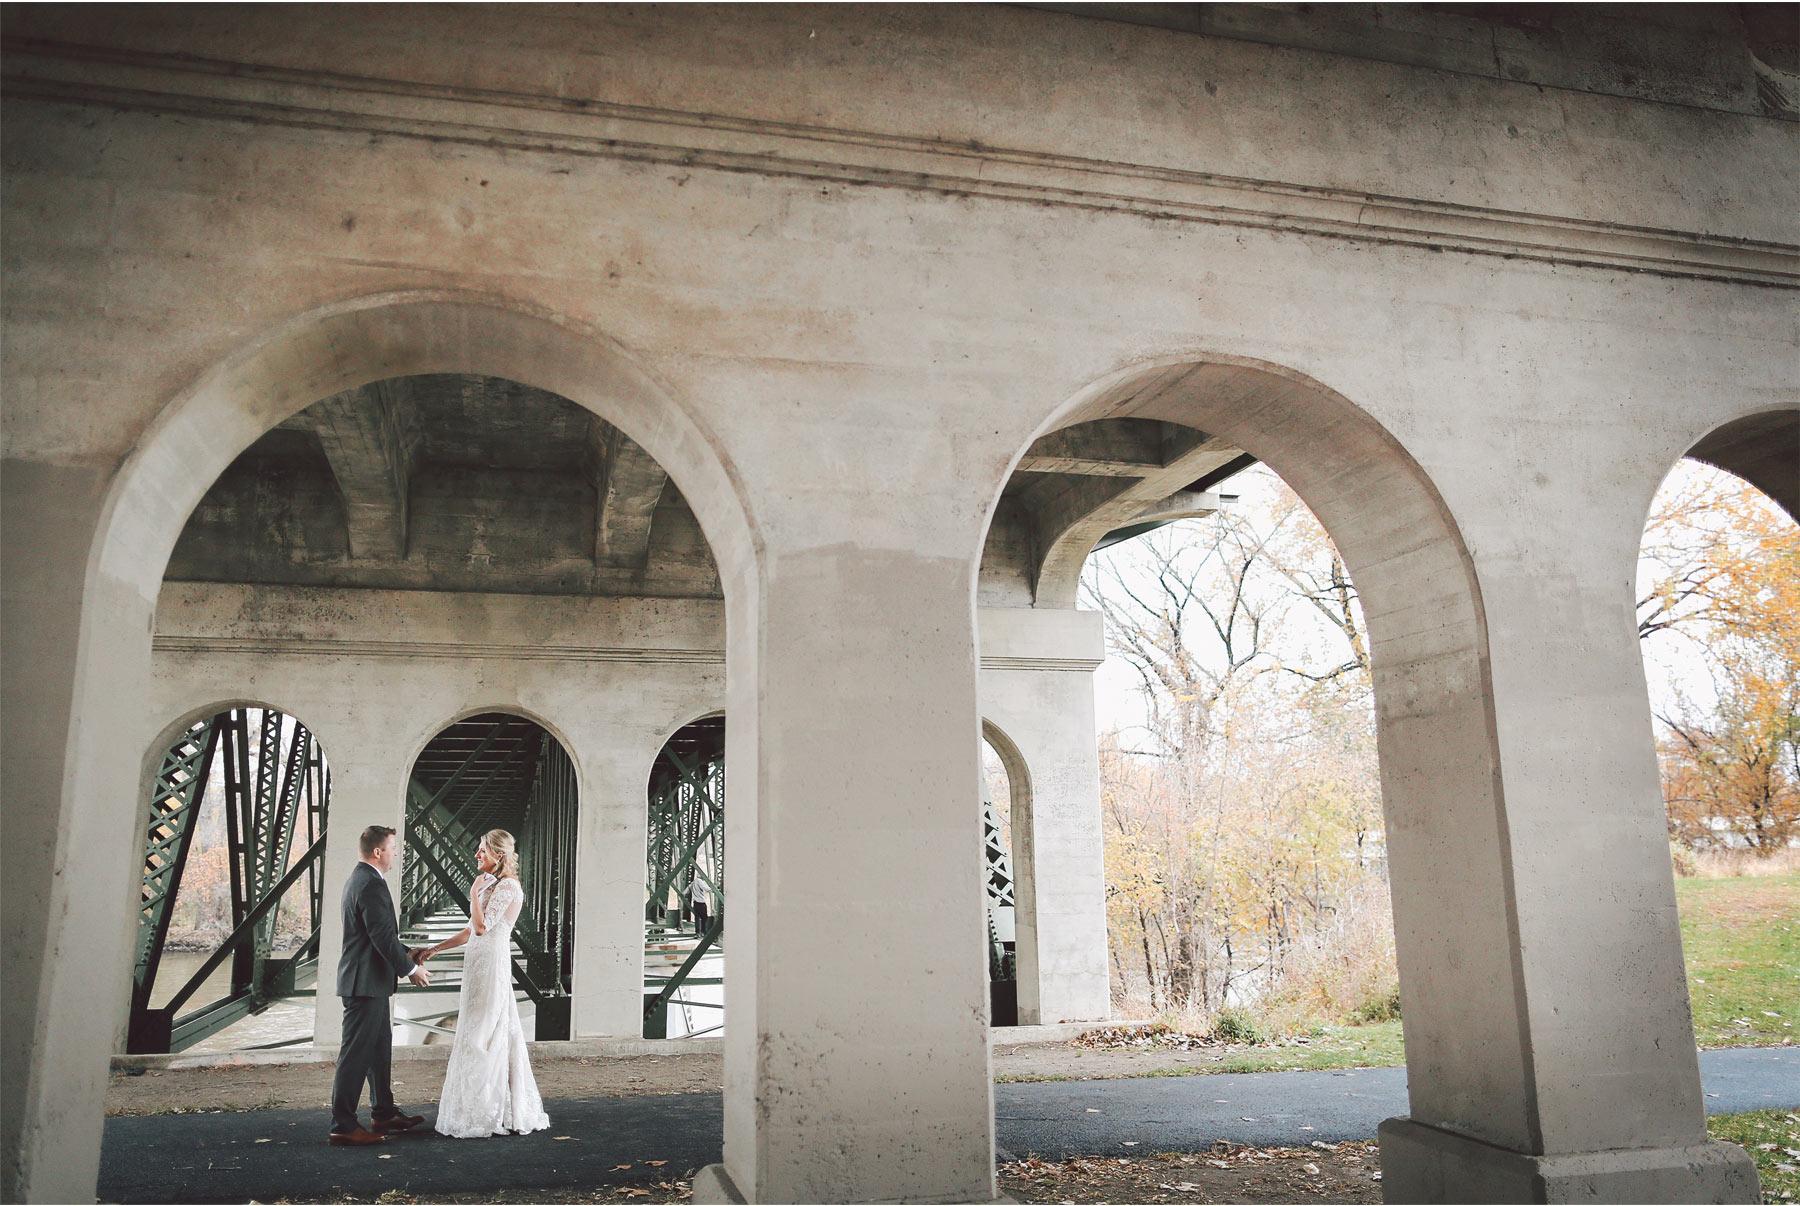 05-Shakopee-Minnesota-Wedding-Photography-by-Vick-Photography-First-Look-Bridge-Amber-and-Justin.jpg